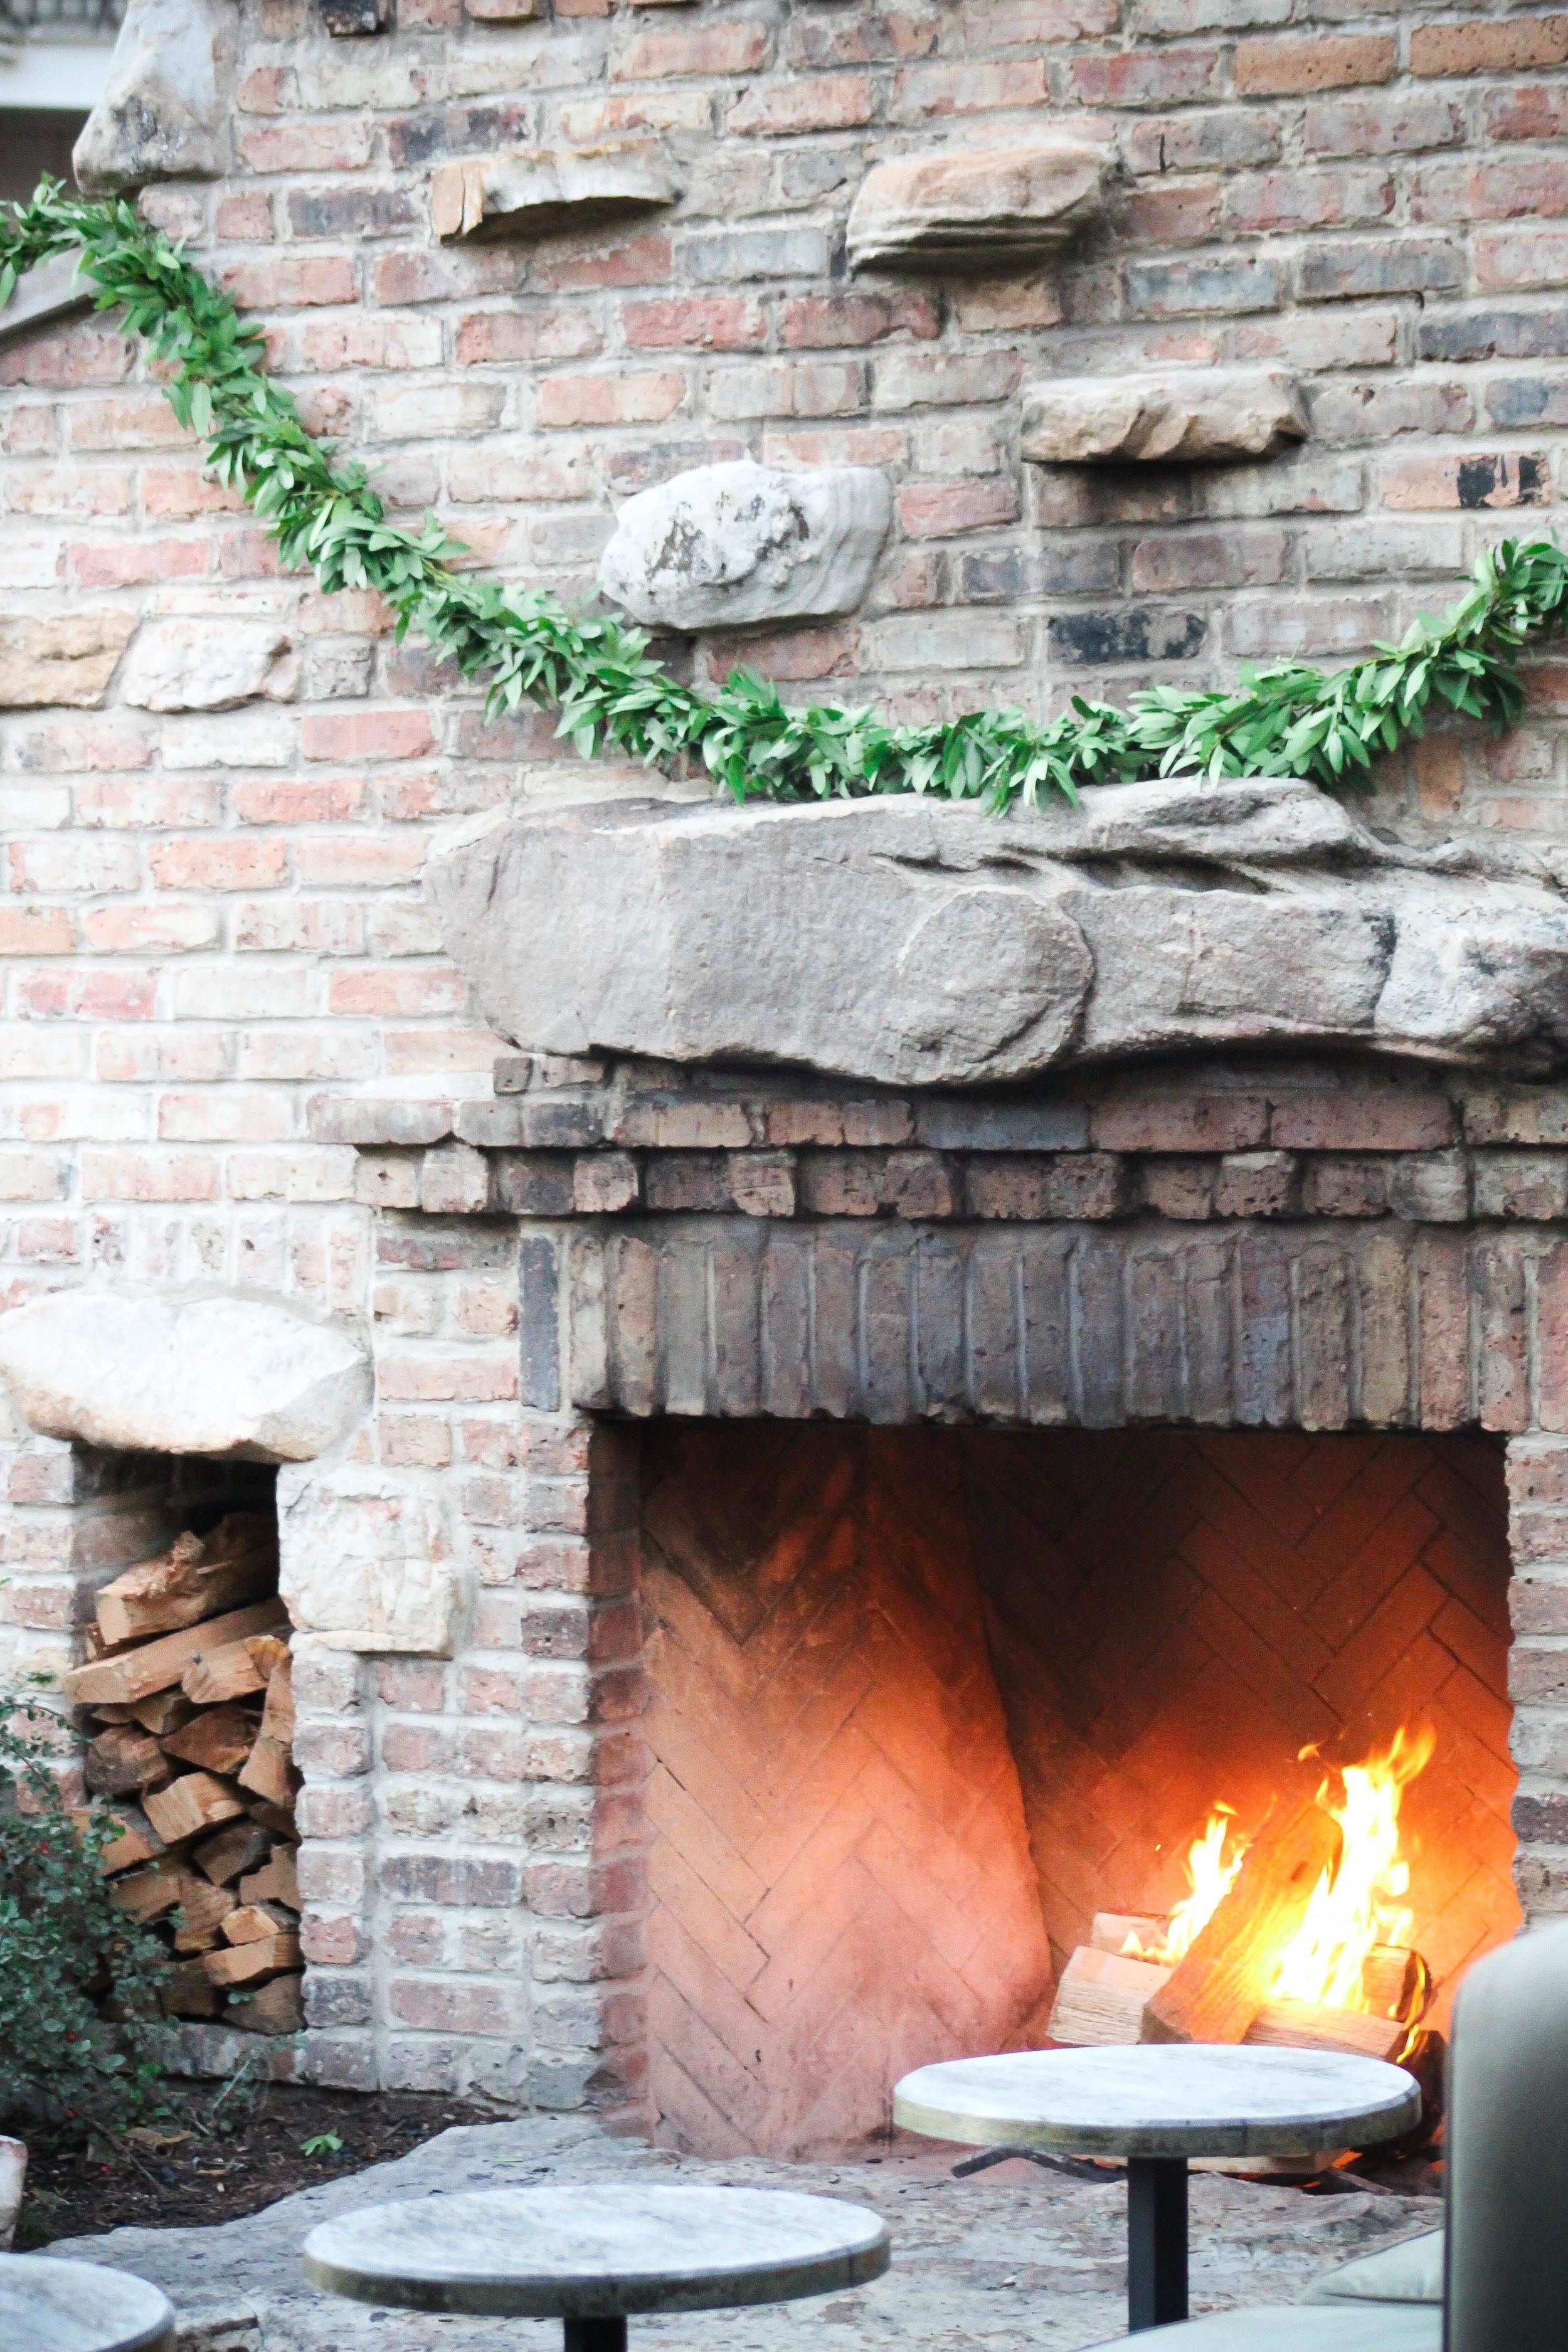 Dawson_Fireplace_outside_110816_KW (1).jpg